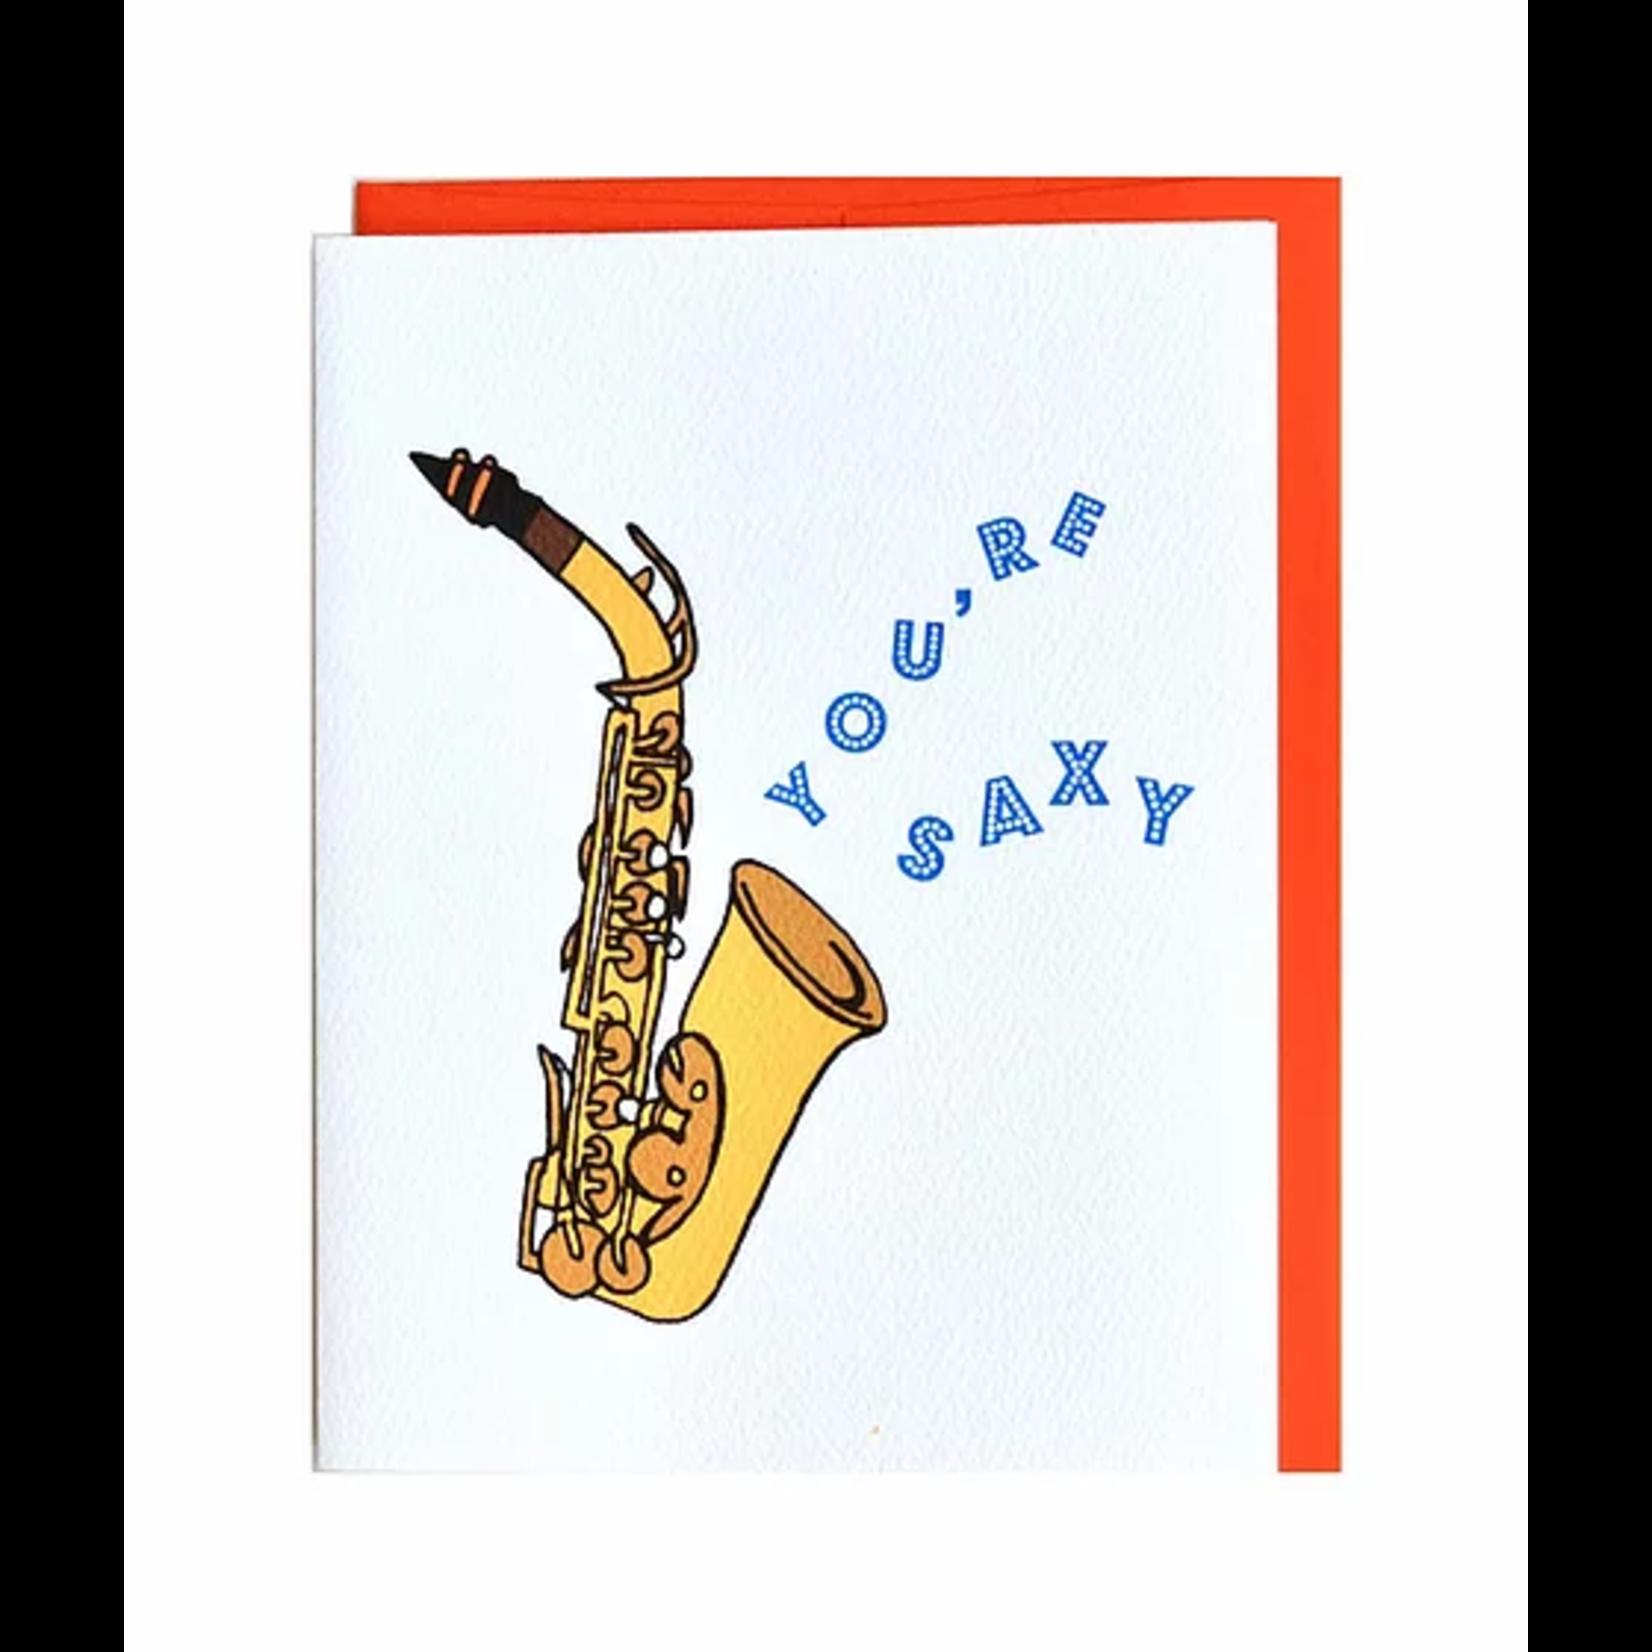 Cracked Designs You're Saxy Saxaphone Greeting Card